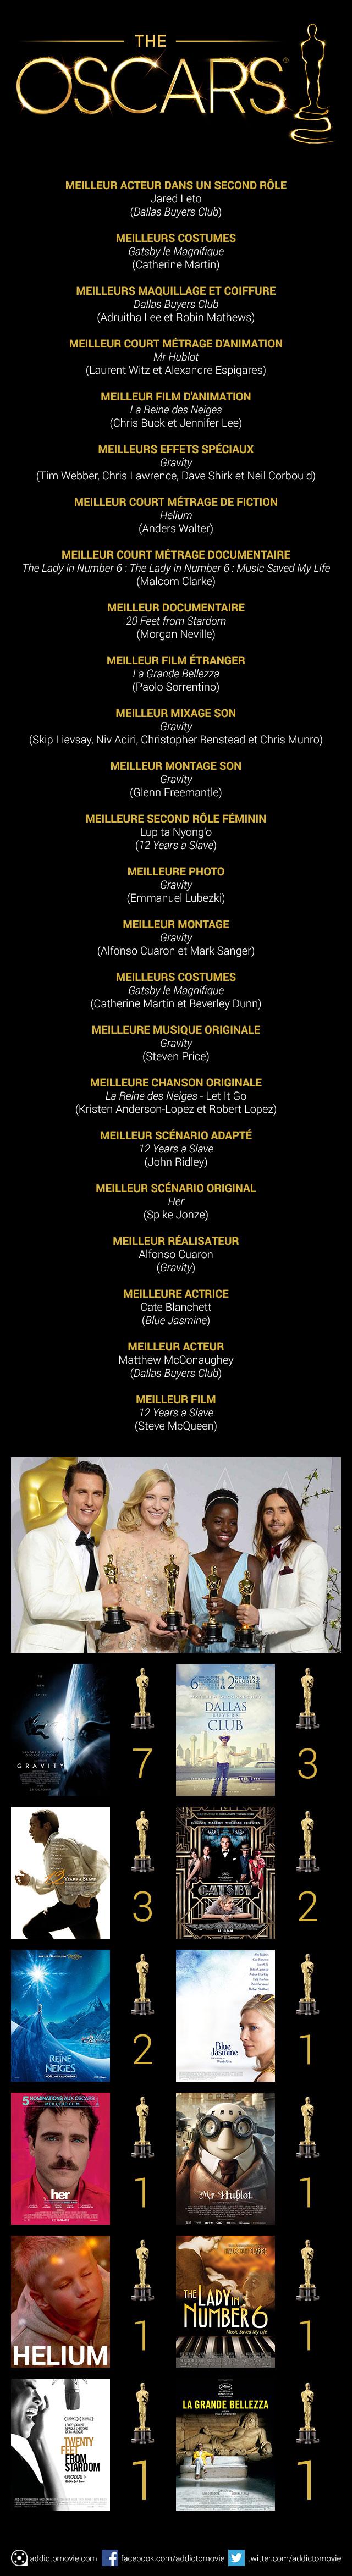 Oscars-infographie-Addictomovie